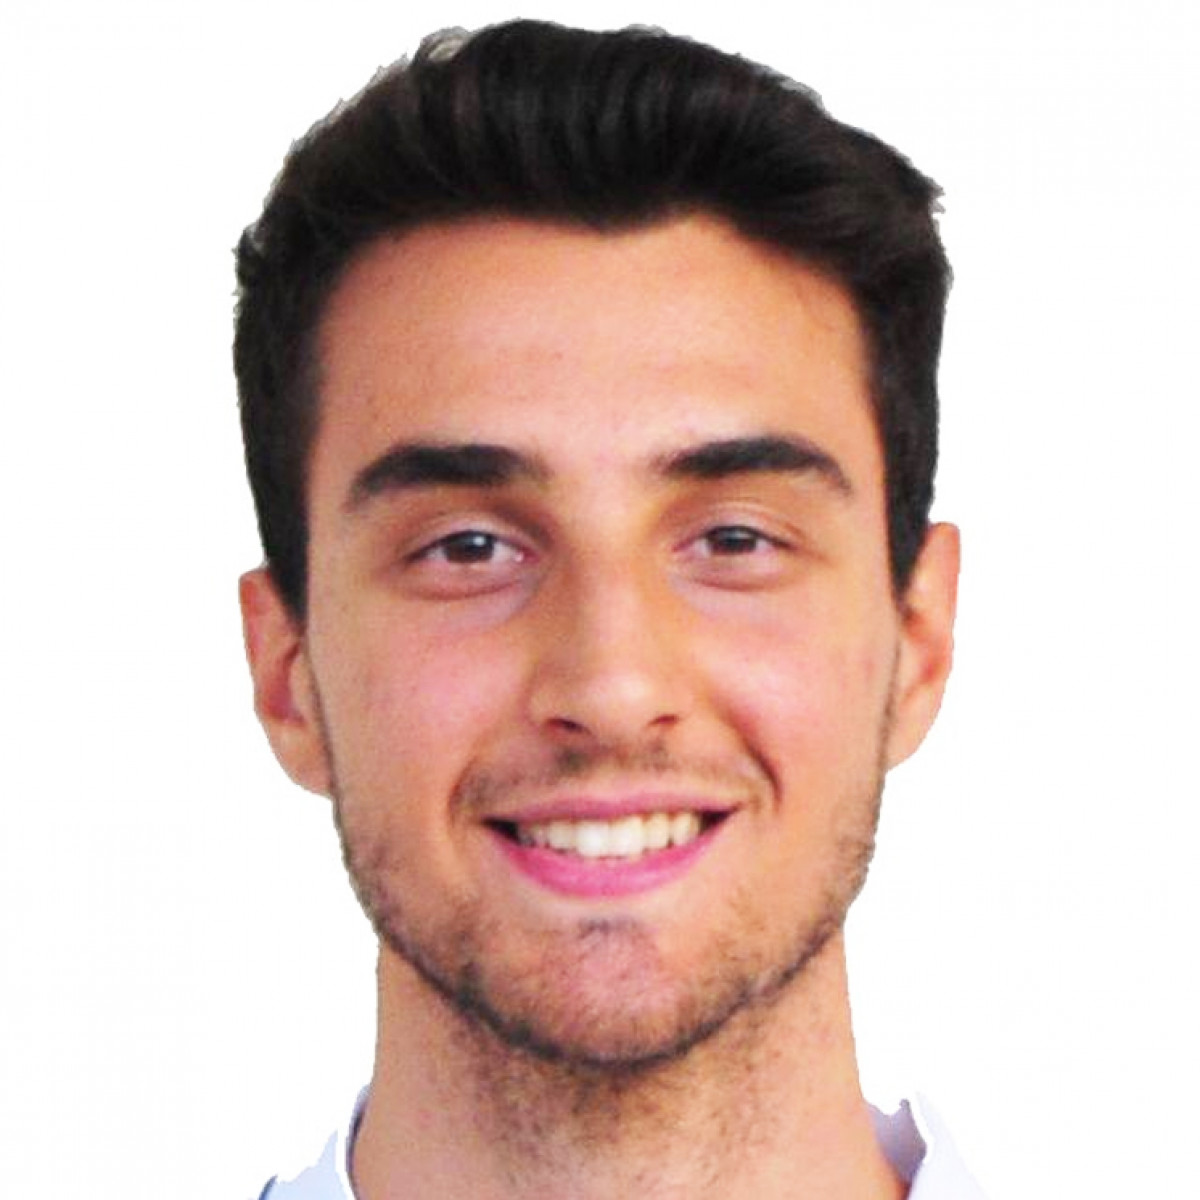 Ruben Zugno